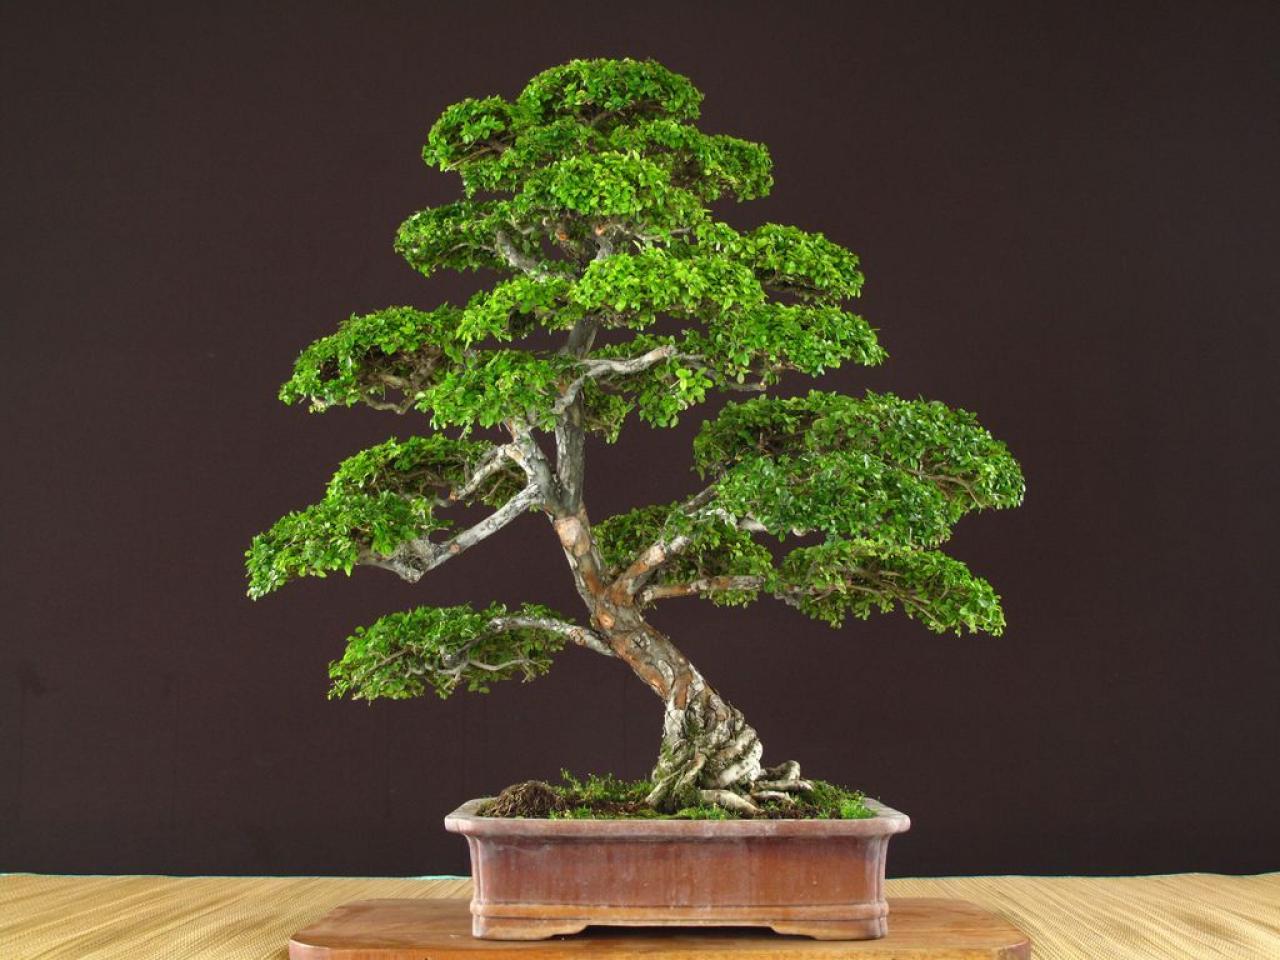 El arte de los bons is lifestyle de am ricaeconom a - Tierra para bonsais ...